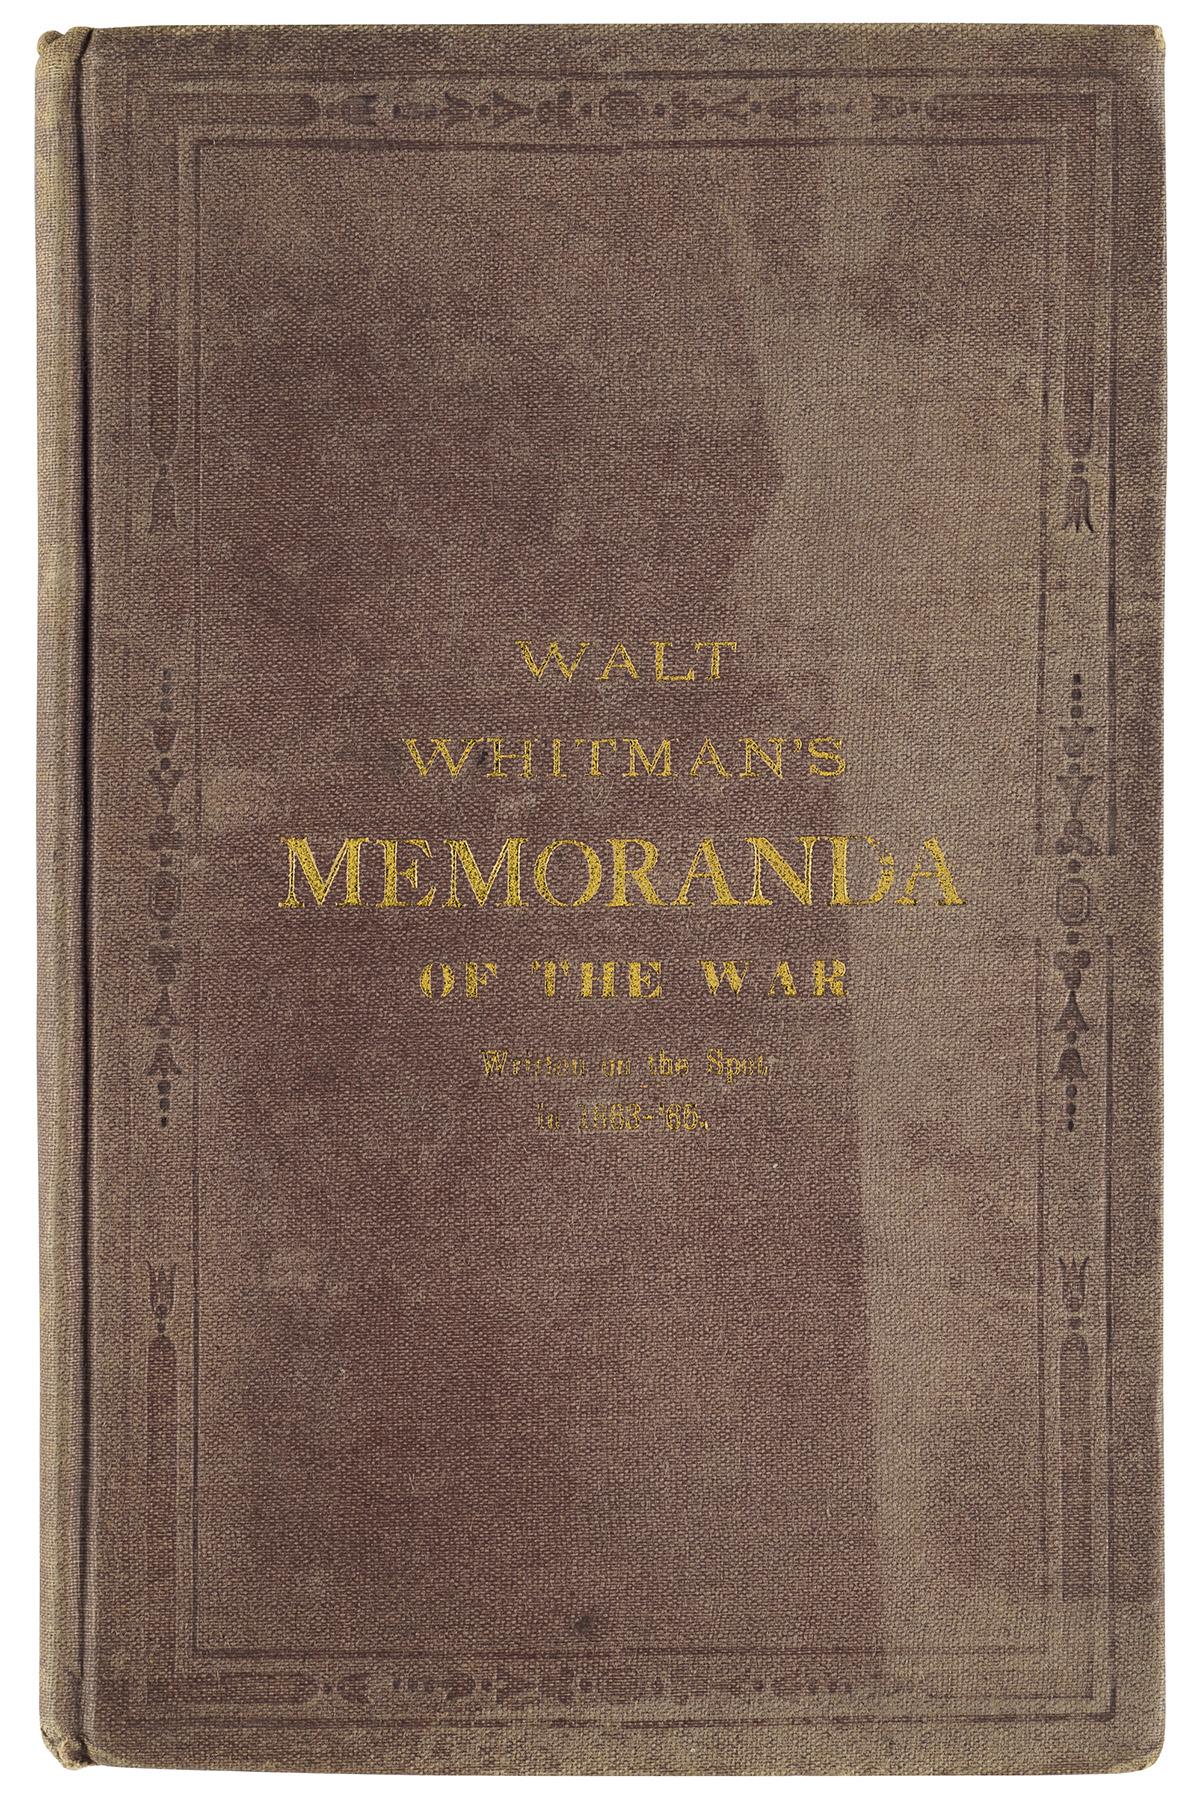 WALT-WHITMAN-(1819-1892)--Memoranda-Of-the-War